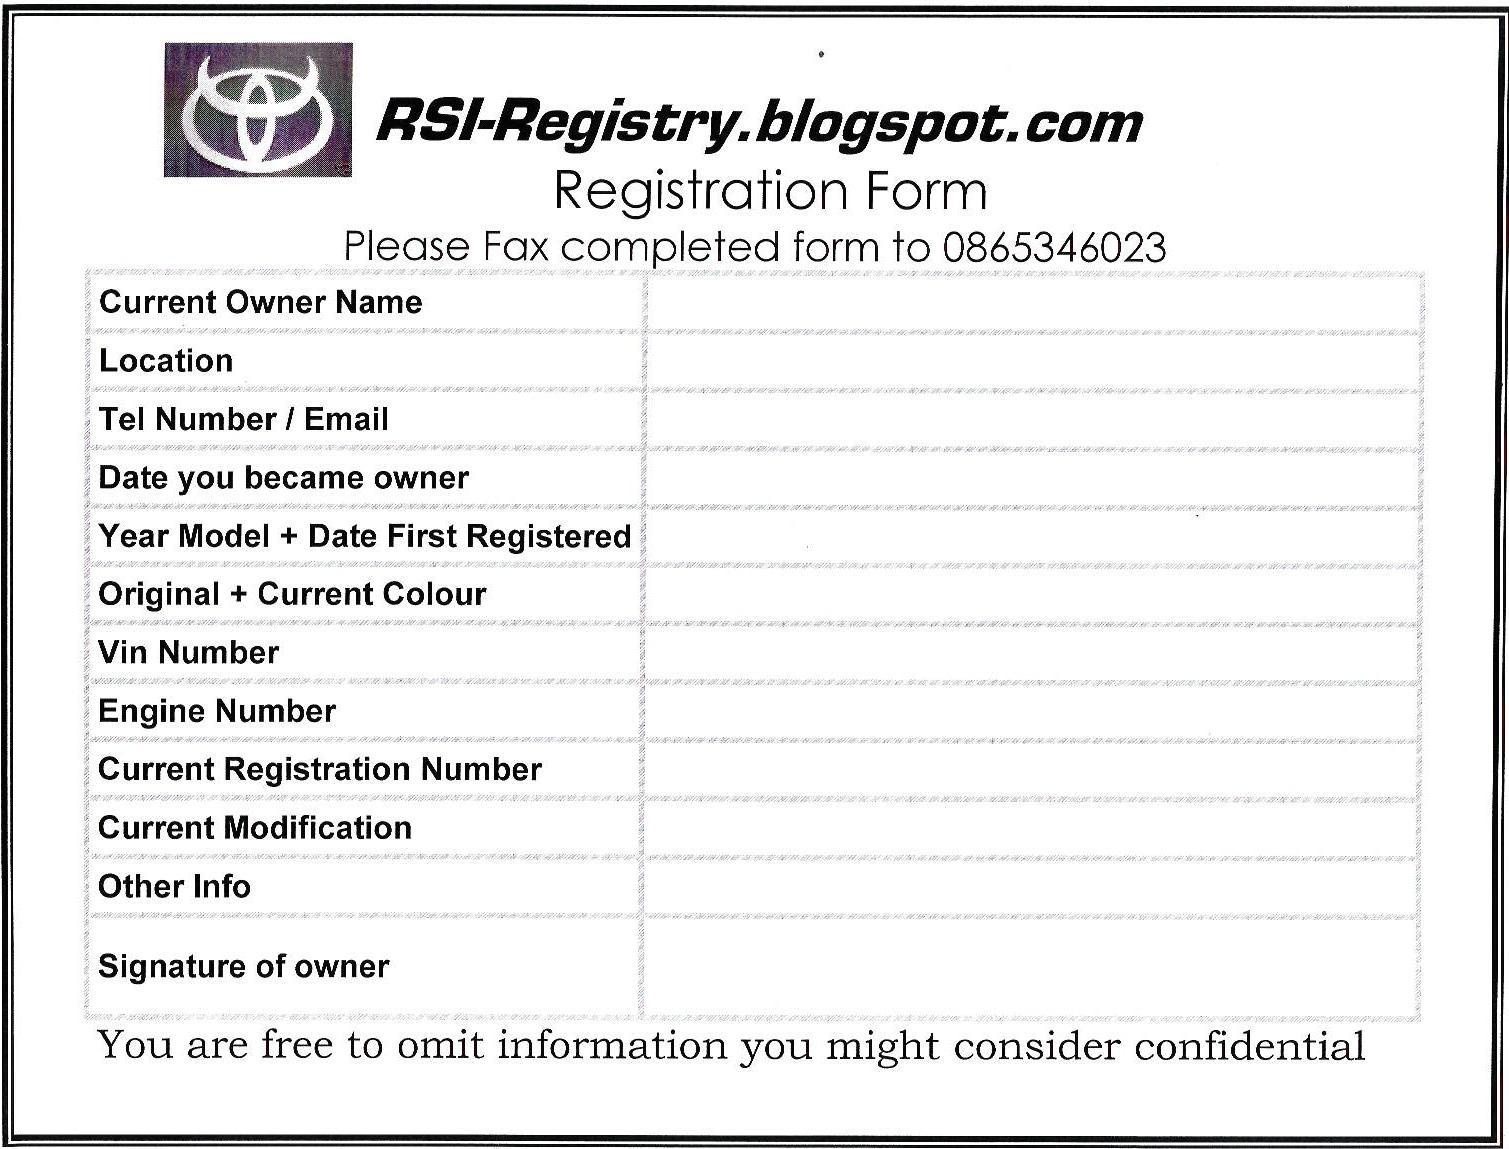 The Rsi Registry Registration Form For The Rsi Registry